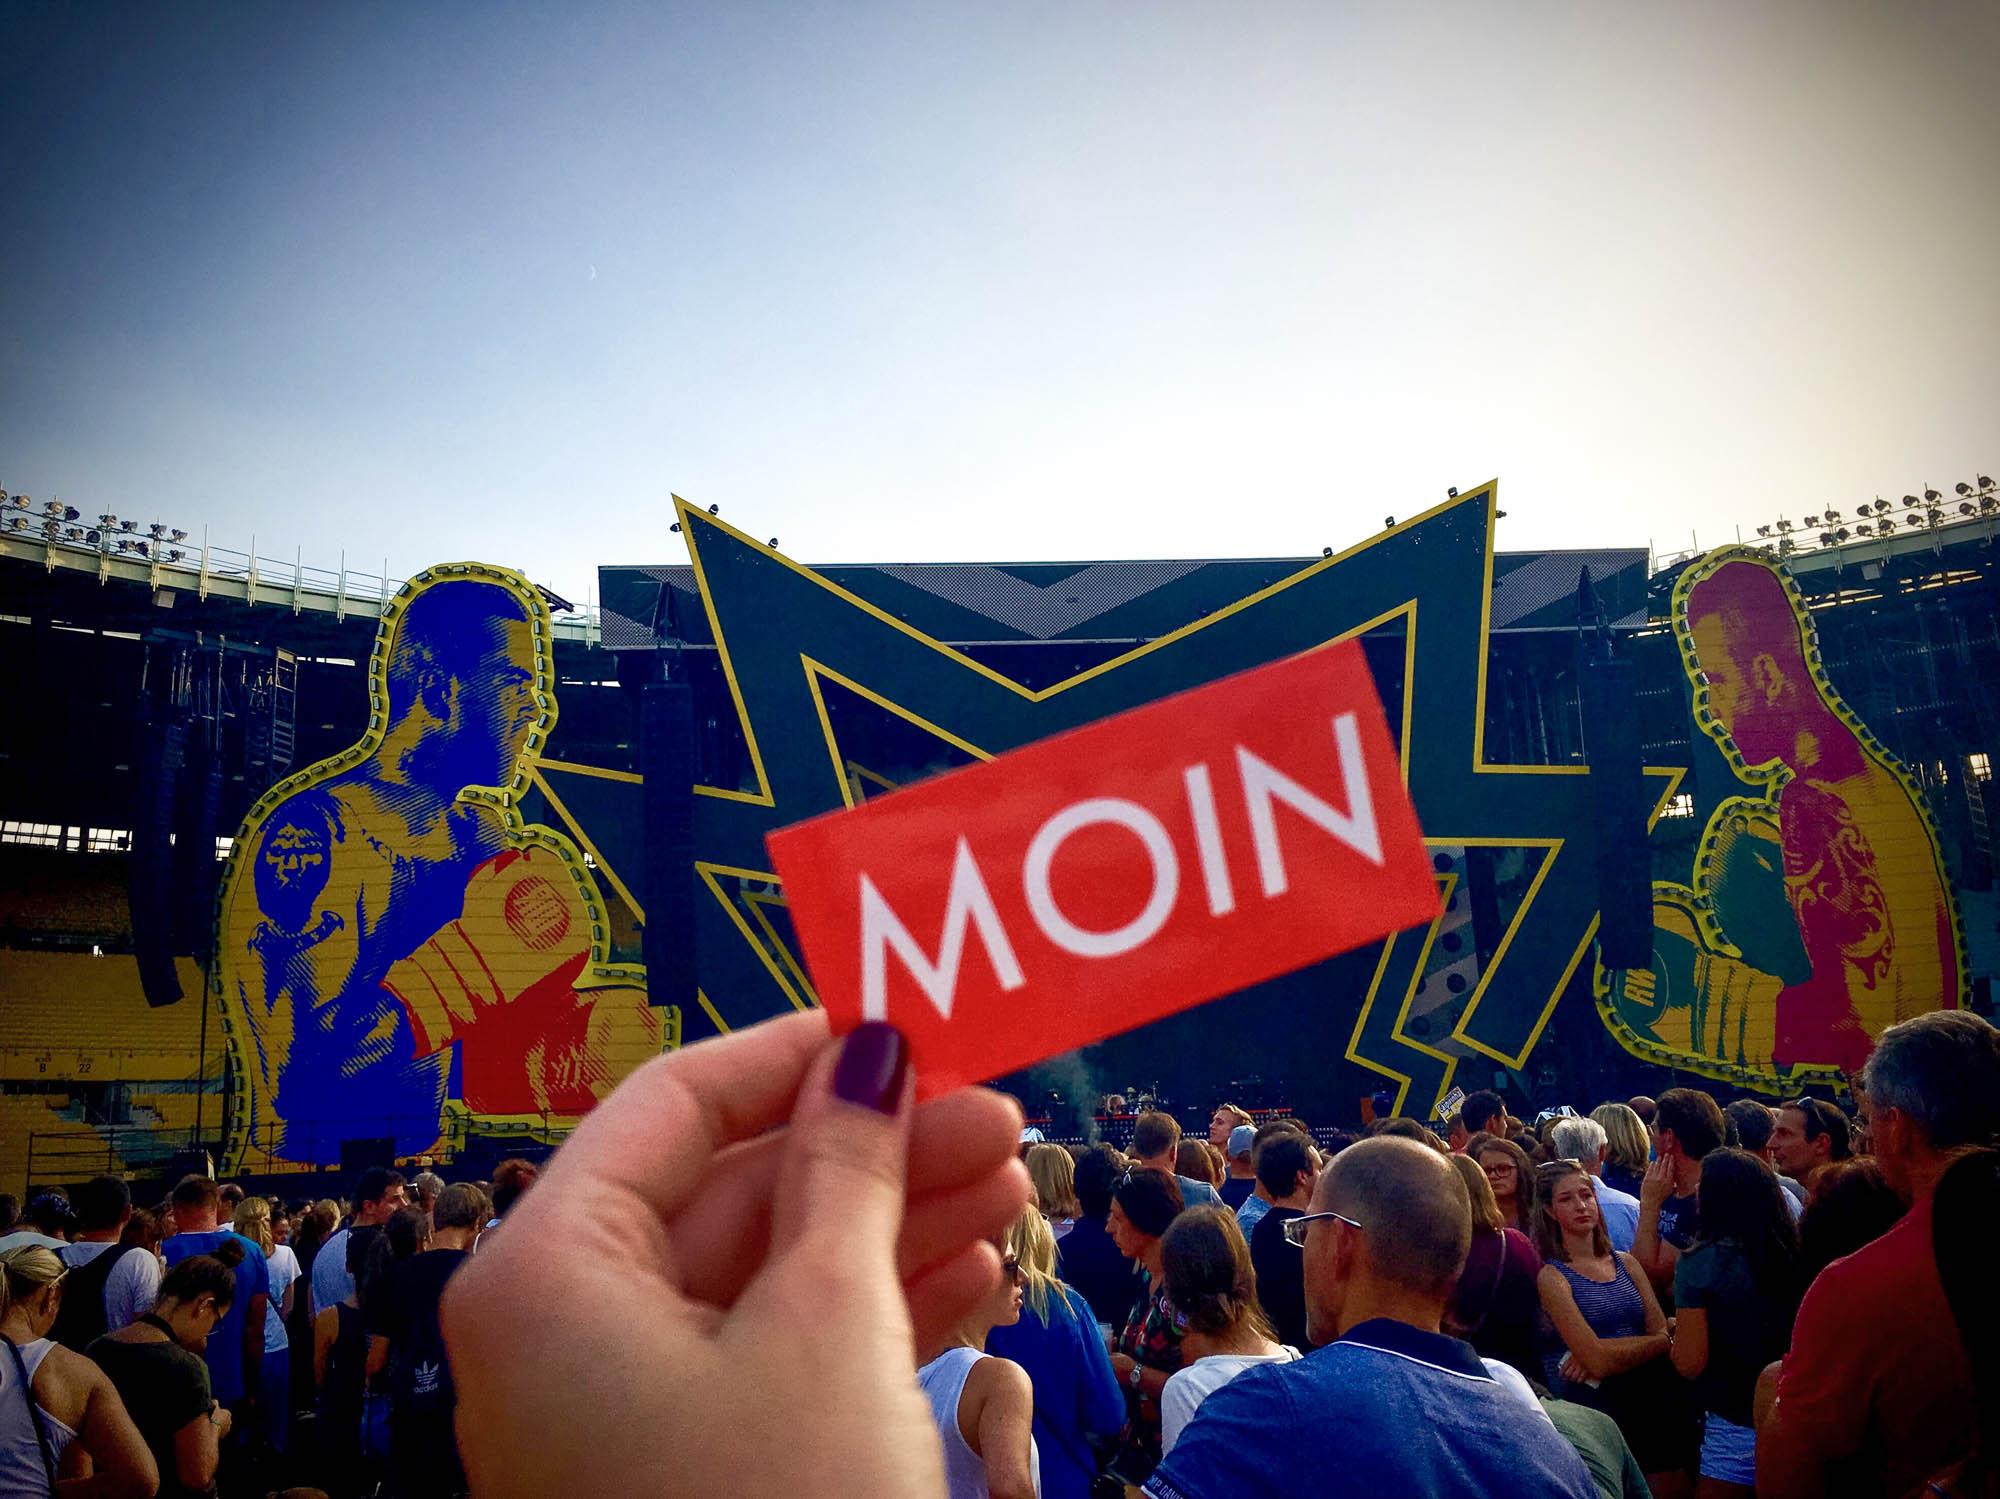 MOIN aus Wien